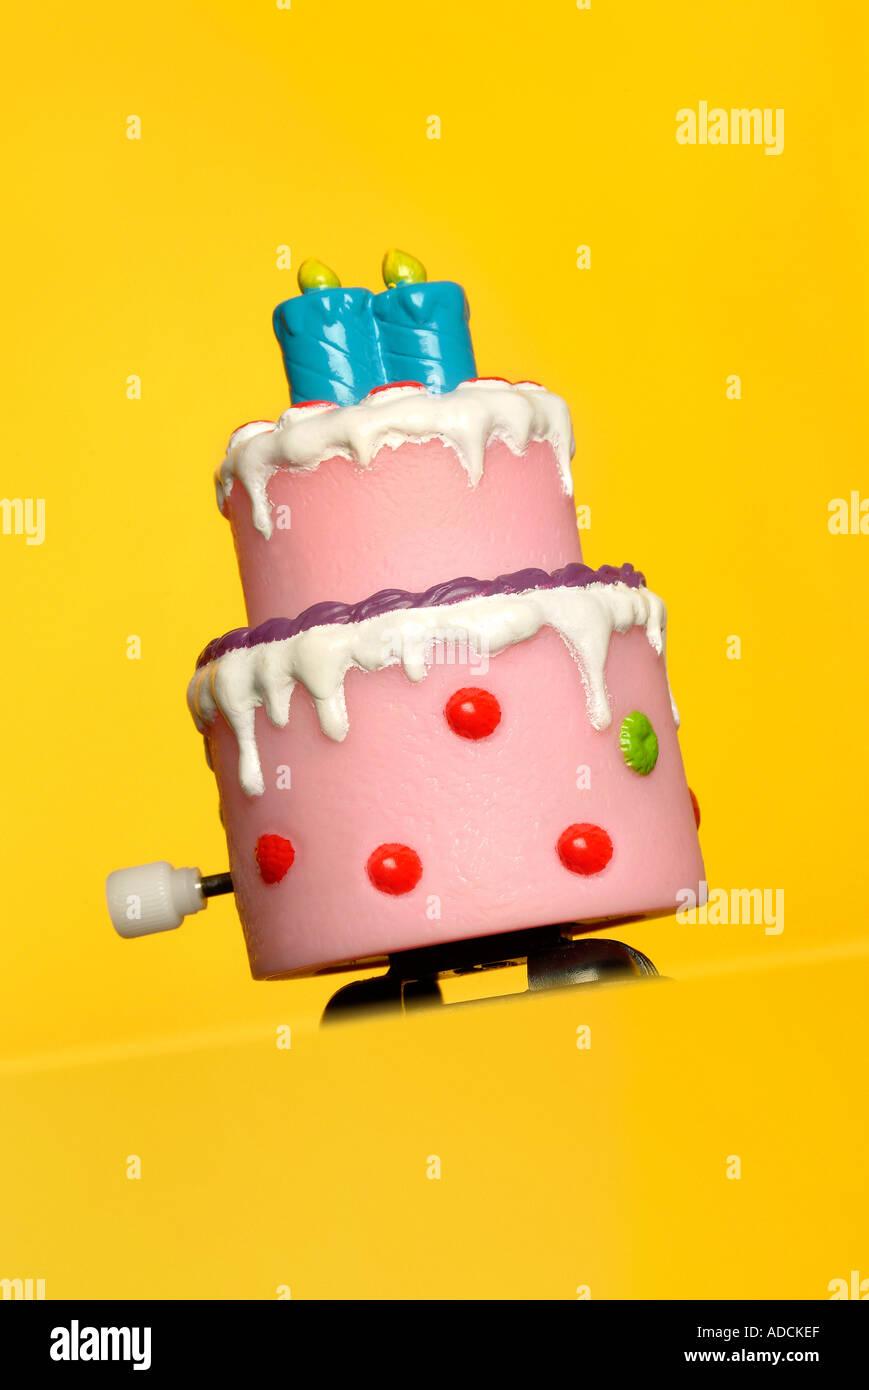 birthday cake Geburtstagskuchen - Stock Image